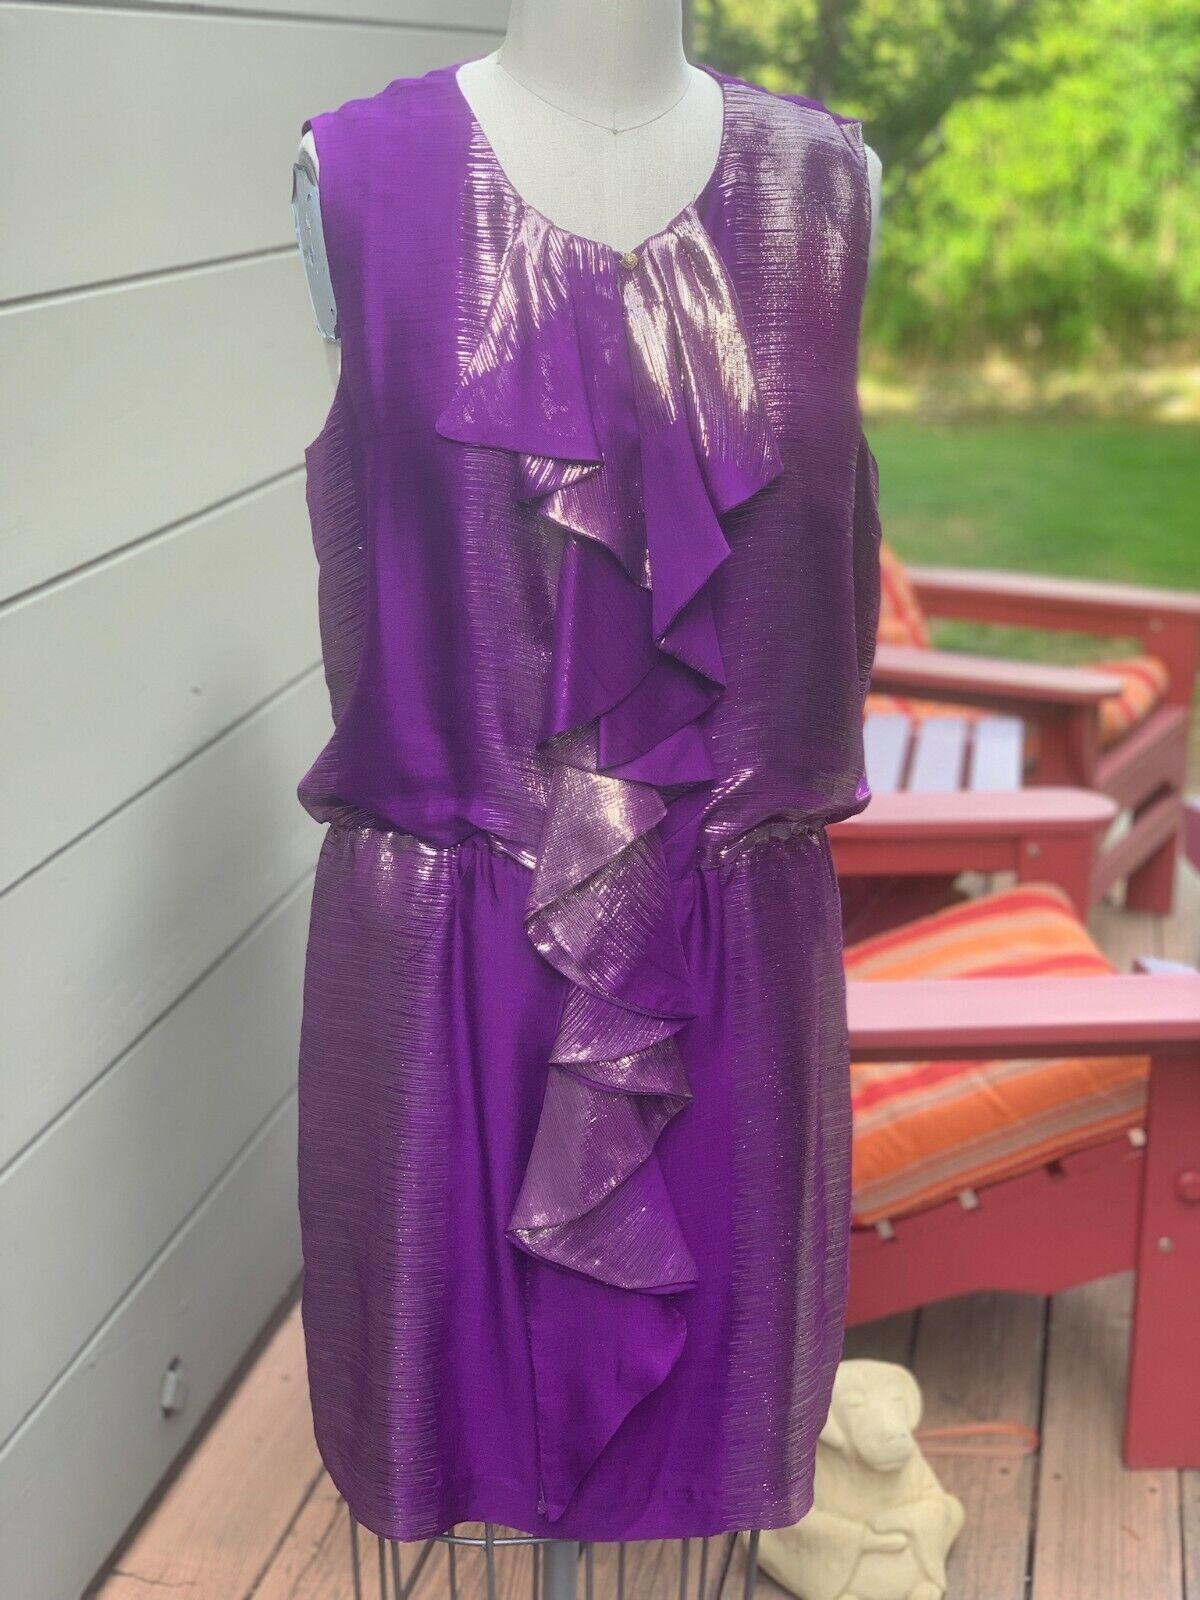 NWT sålde ut Trina Turk Bizet Dress in lila - Storlek 12